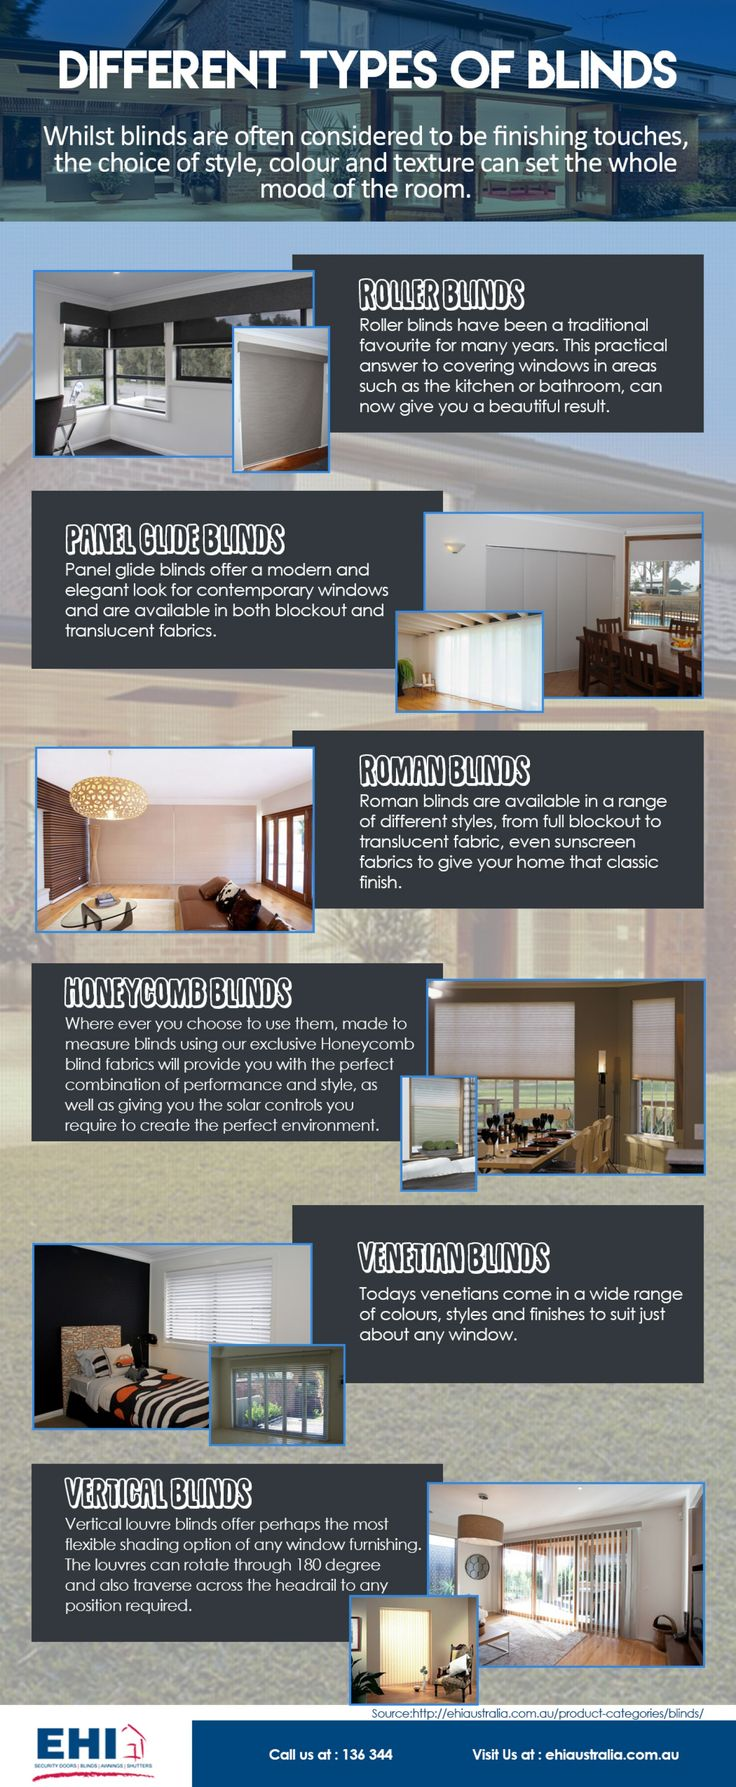 Best 25+ Types of blinds ideas on Pinterest | Types of window ...